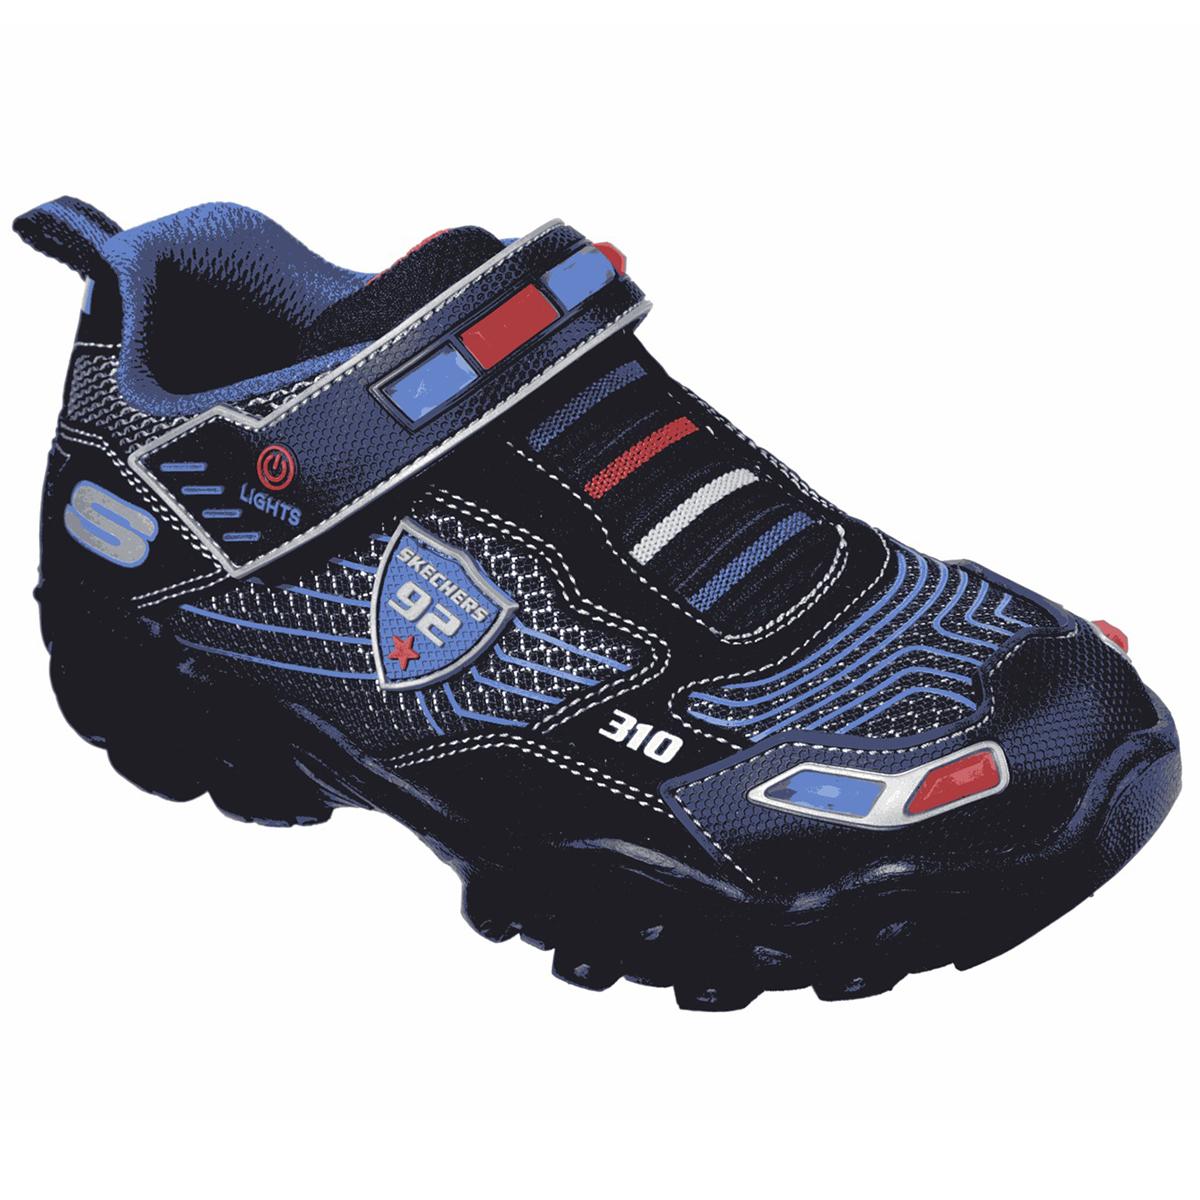 Skechers Boys' Hot Lights: Damager 3 Police Sneaker - Black, 13